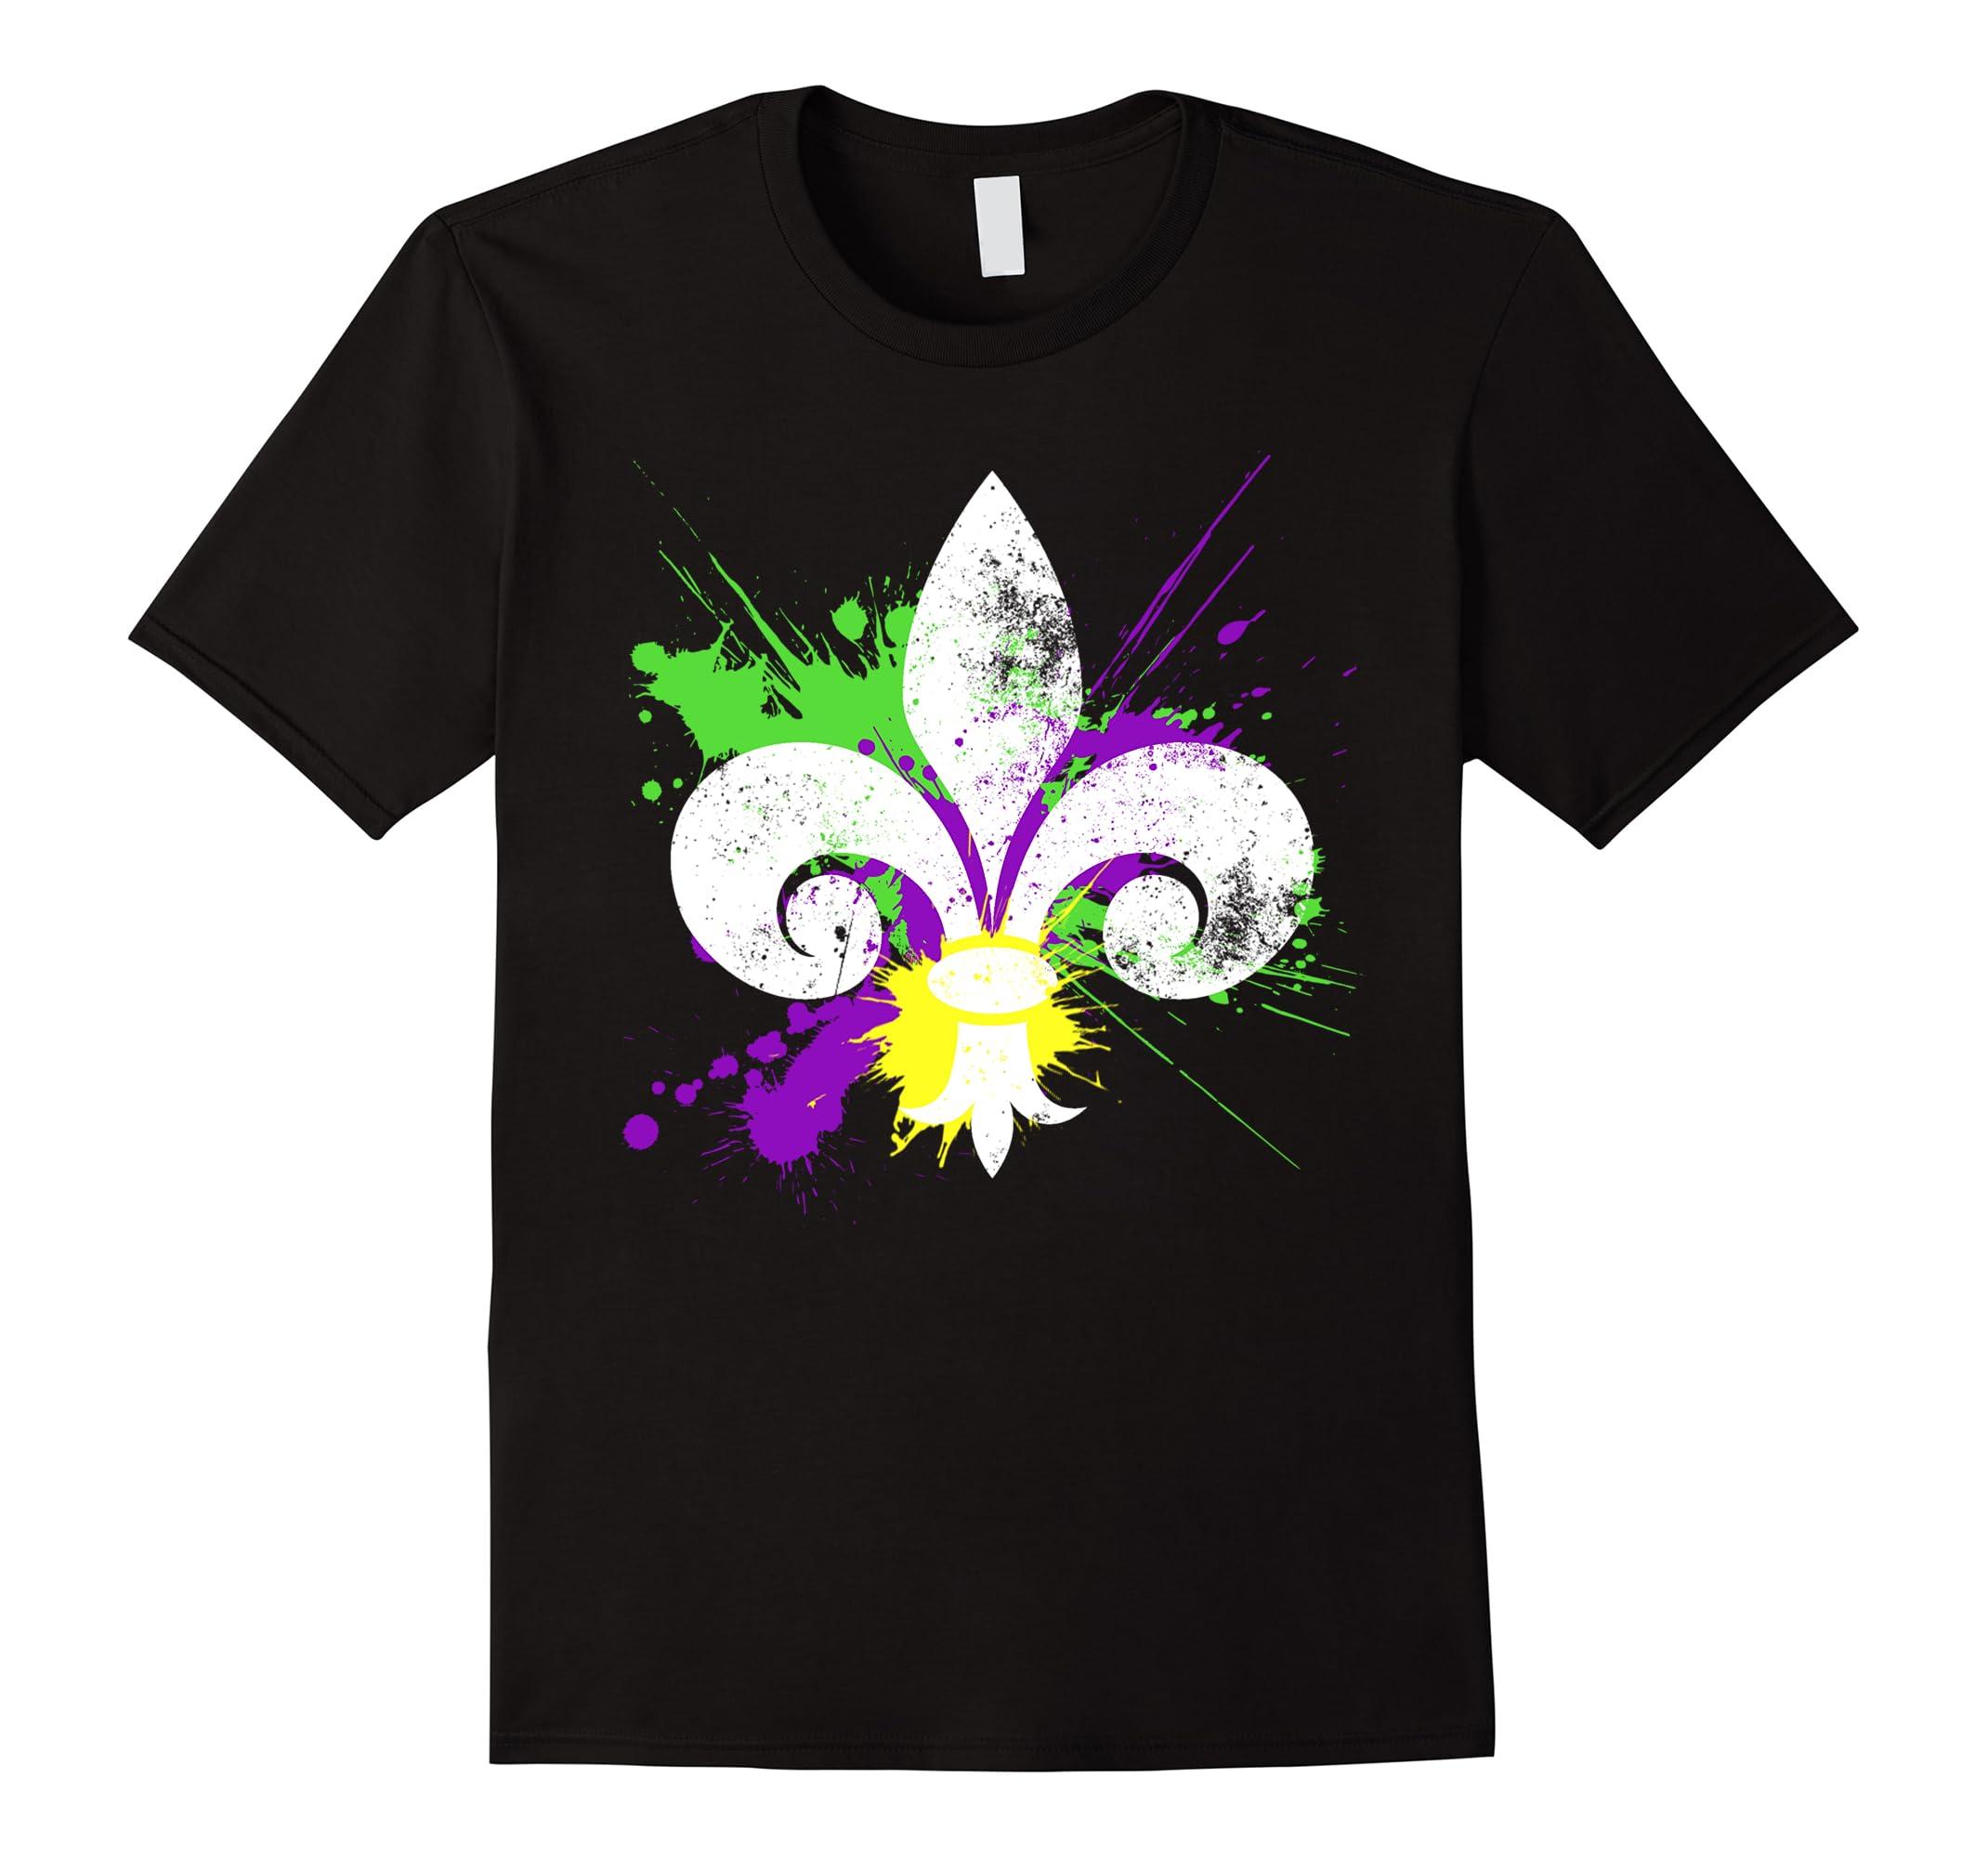 Fleur De Lis Mardi Gras Party Shirt - New Orleans Tshirt-RT